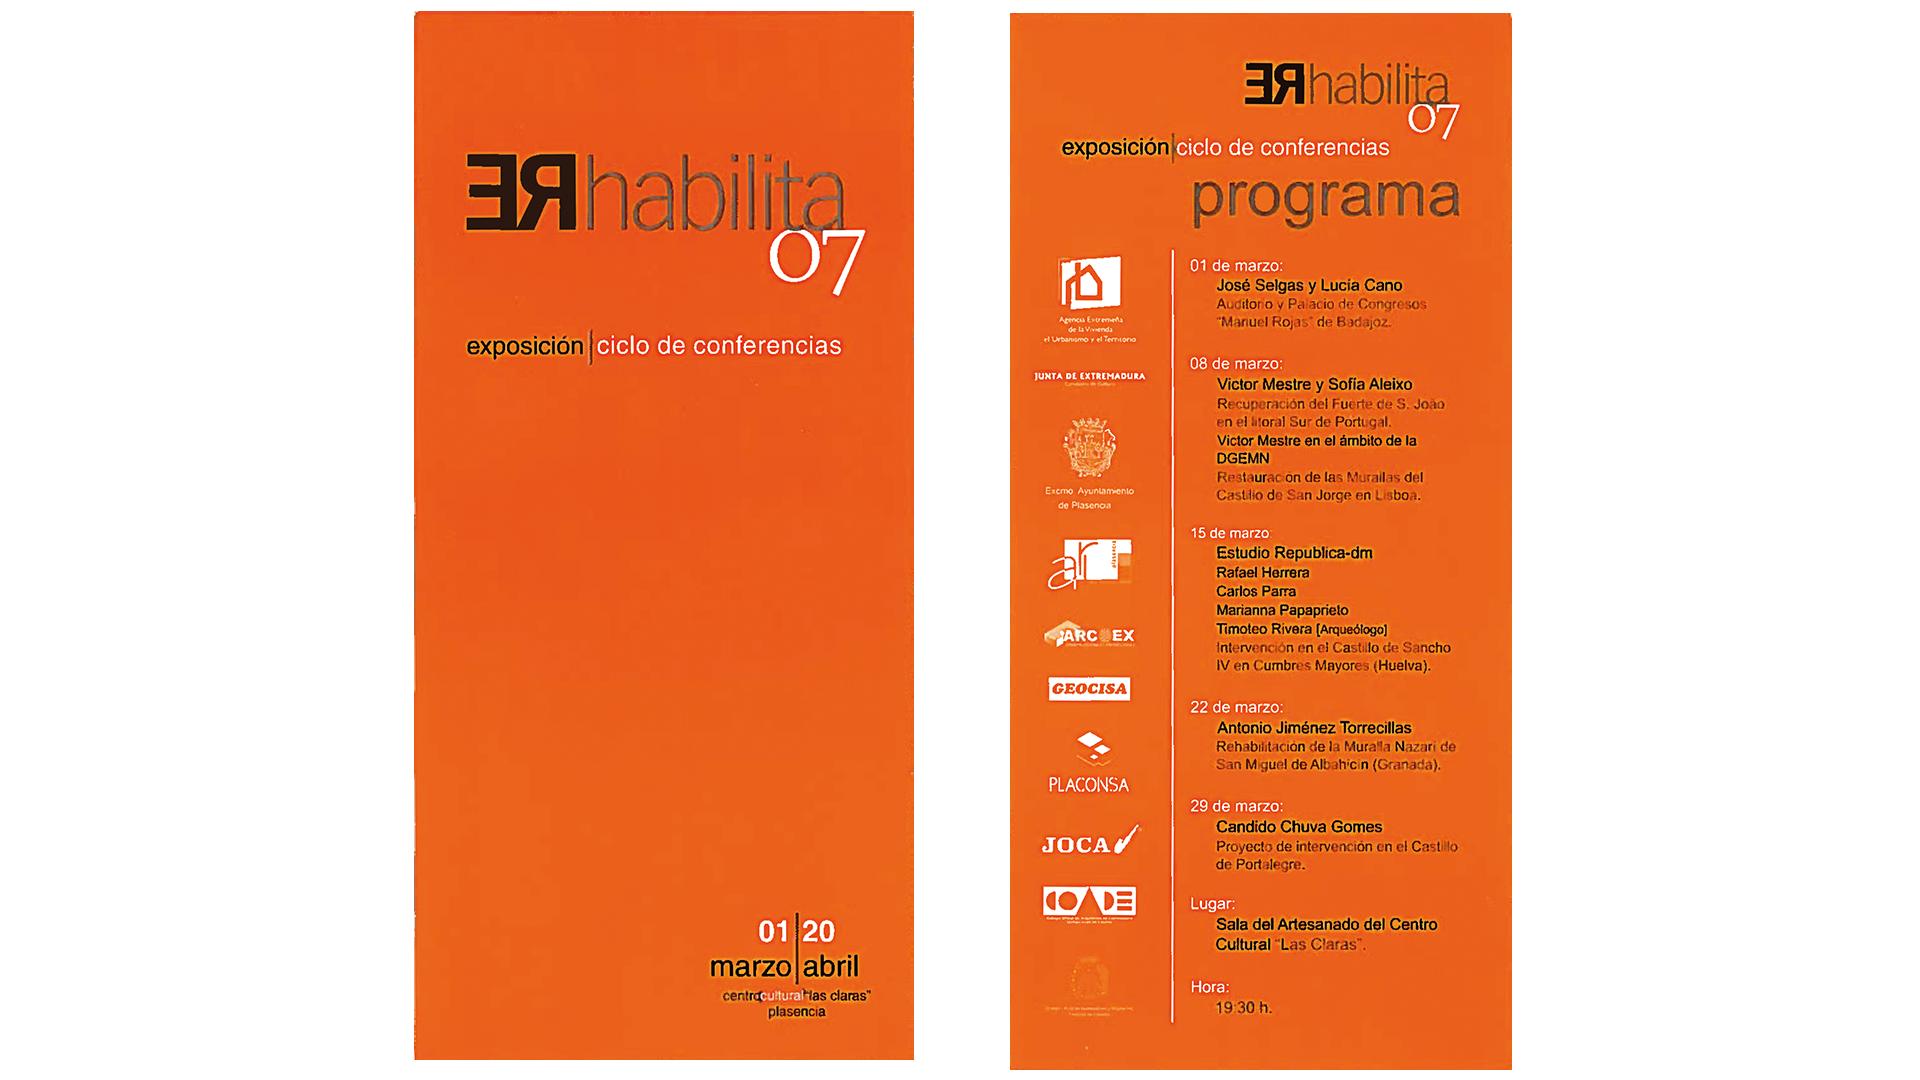 programa rehabilita 2007 plasencia